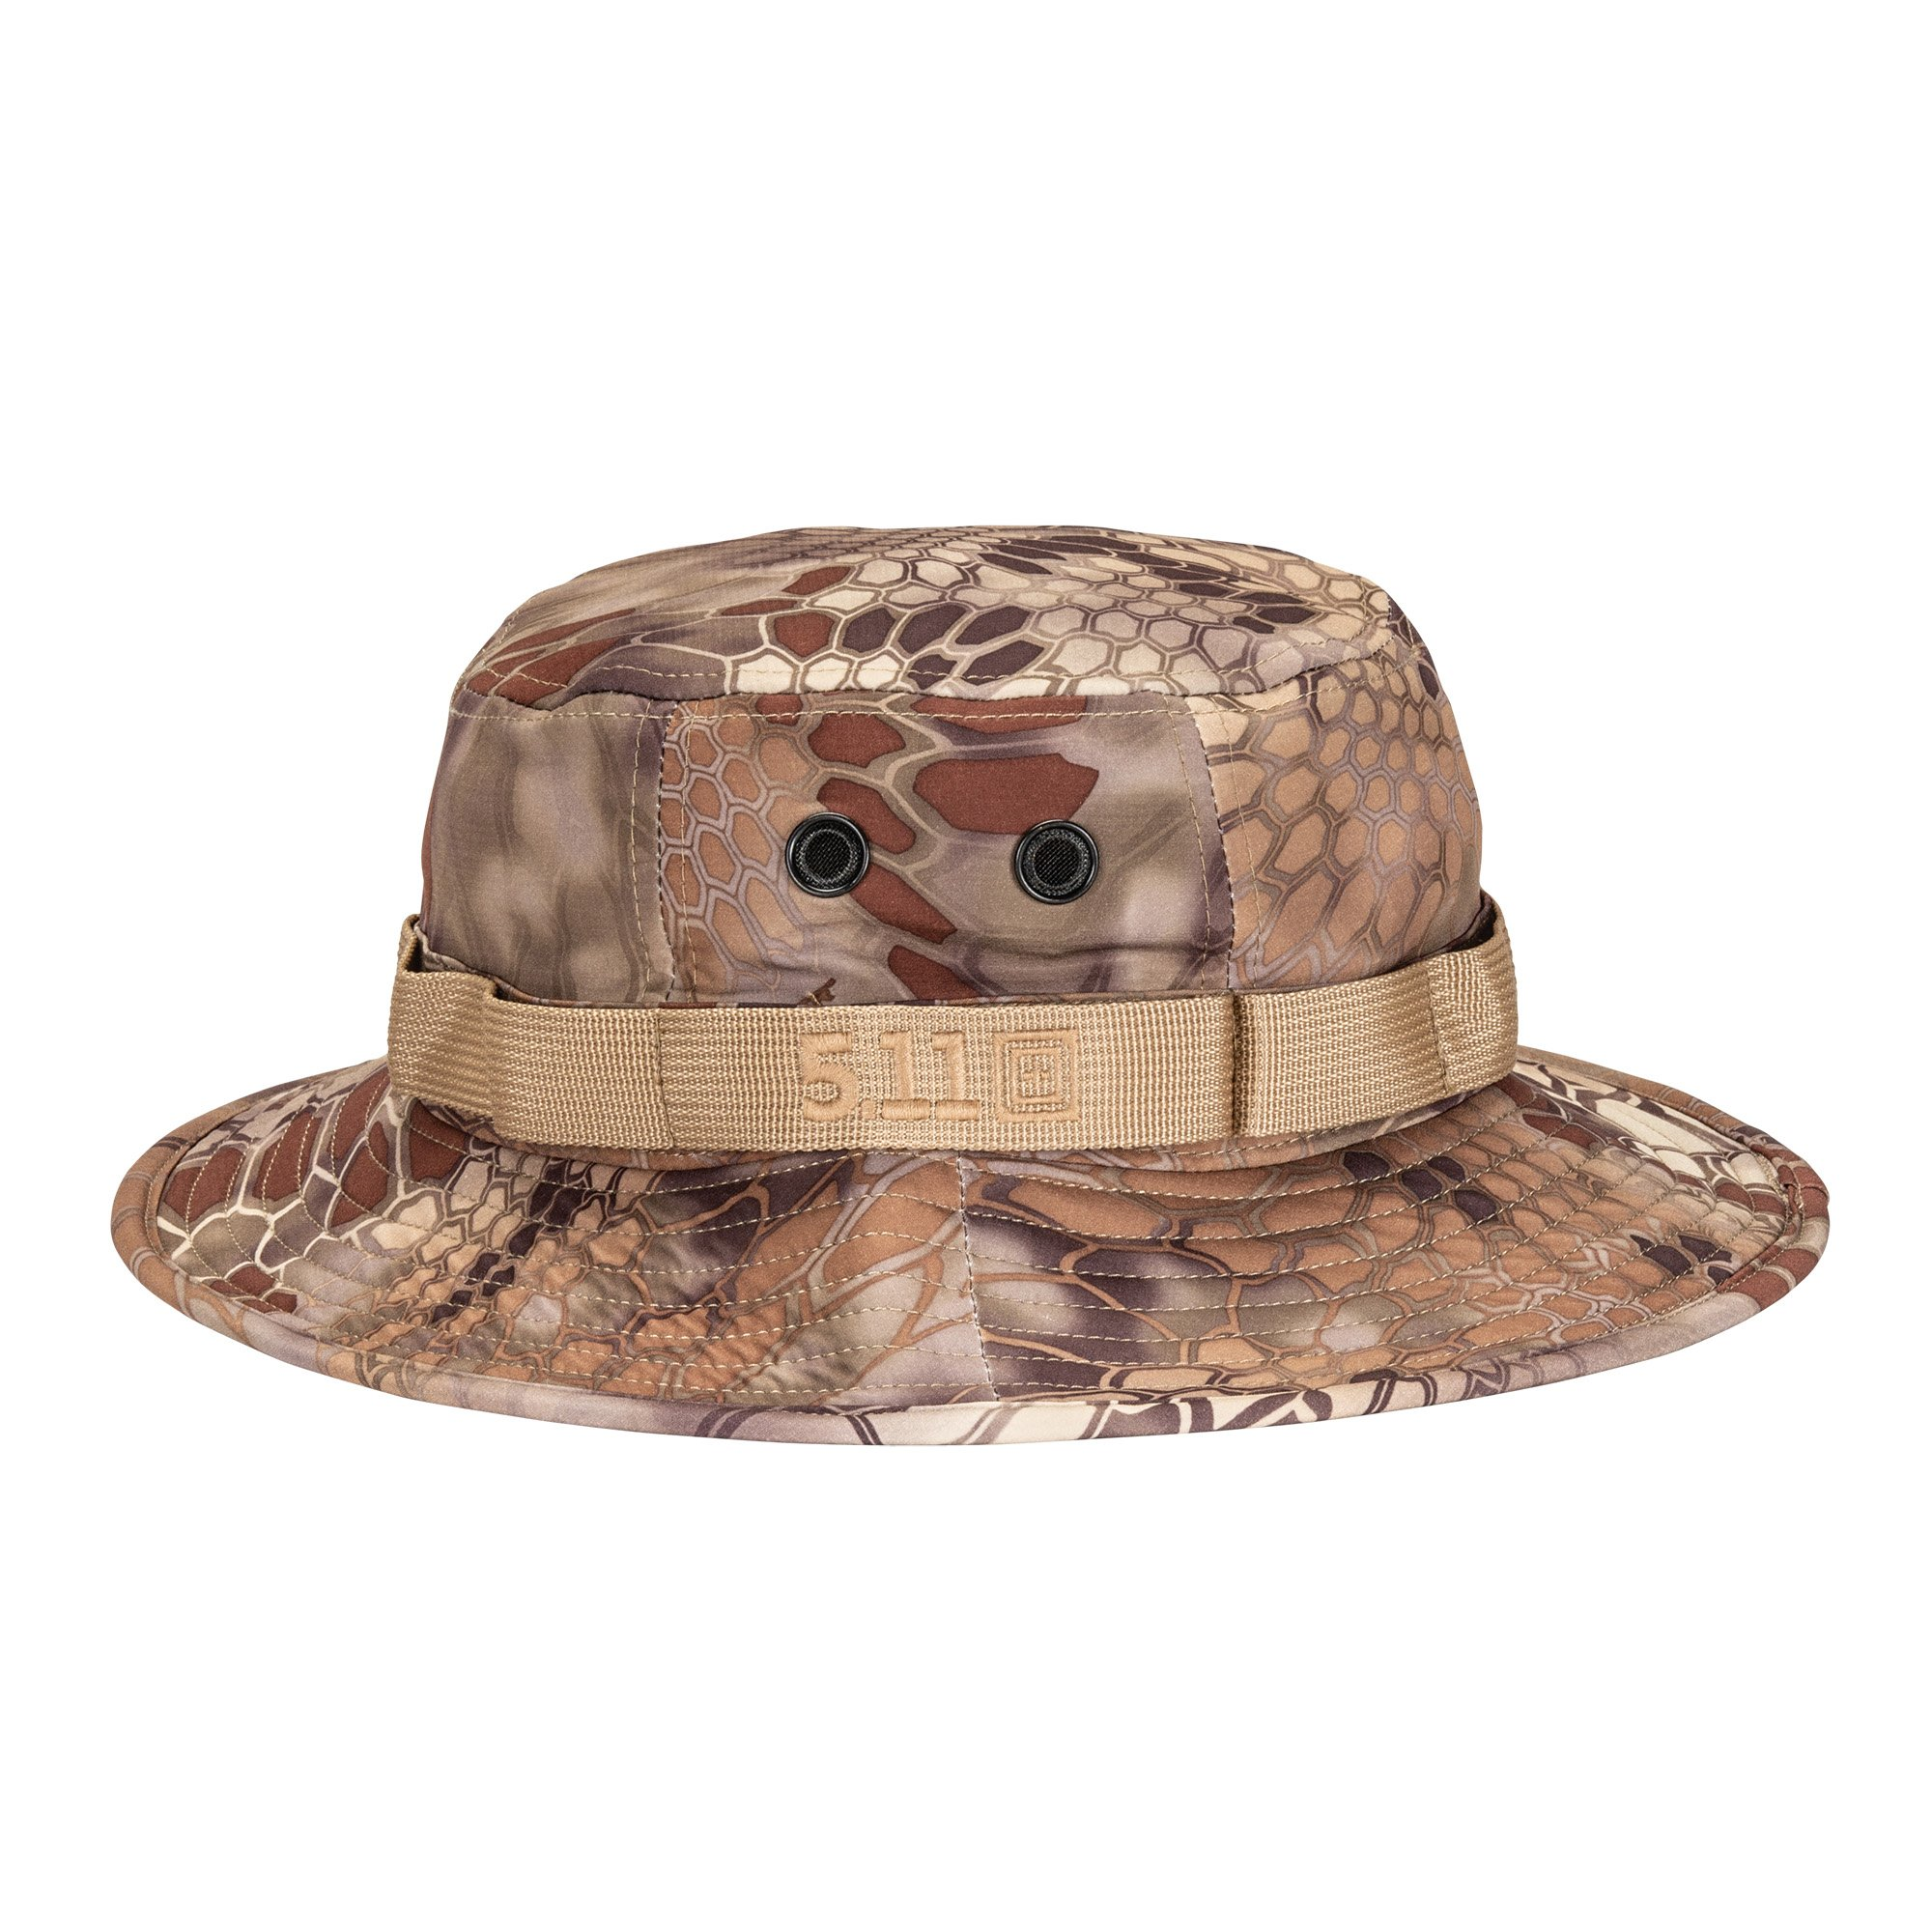 Nón 5.11 Tactical Boonie Hat – HLND